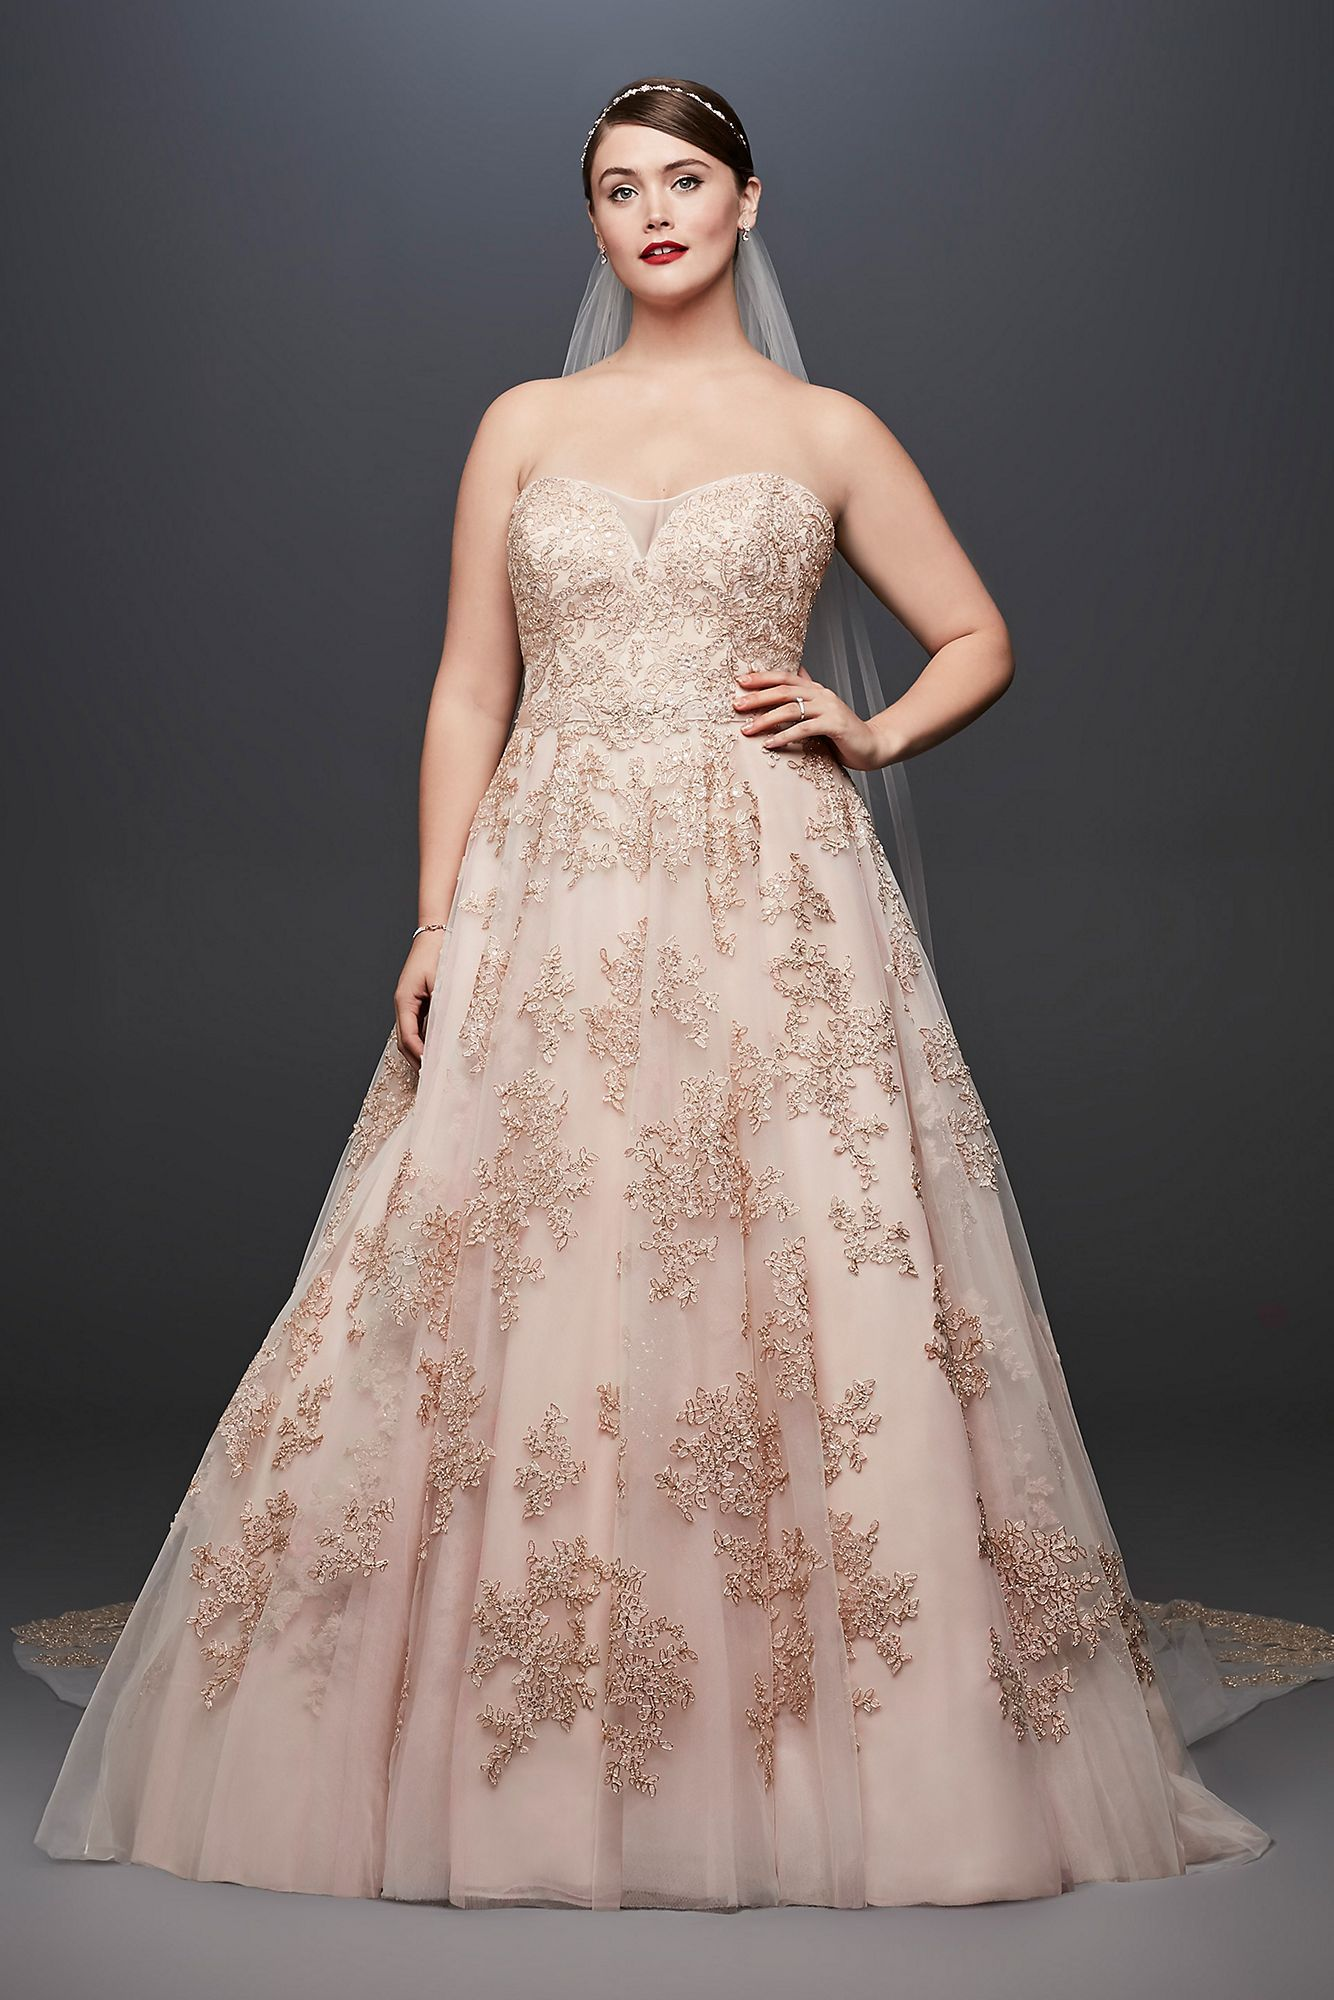 Rose Gold A Line Plus Size Wedding Dress Oleg Cini Style 8cwg767